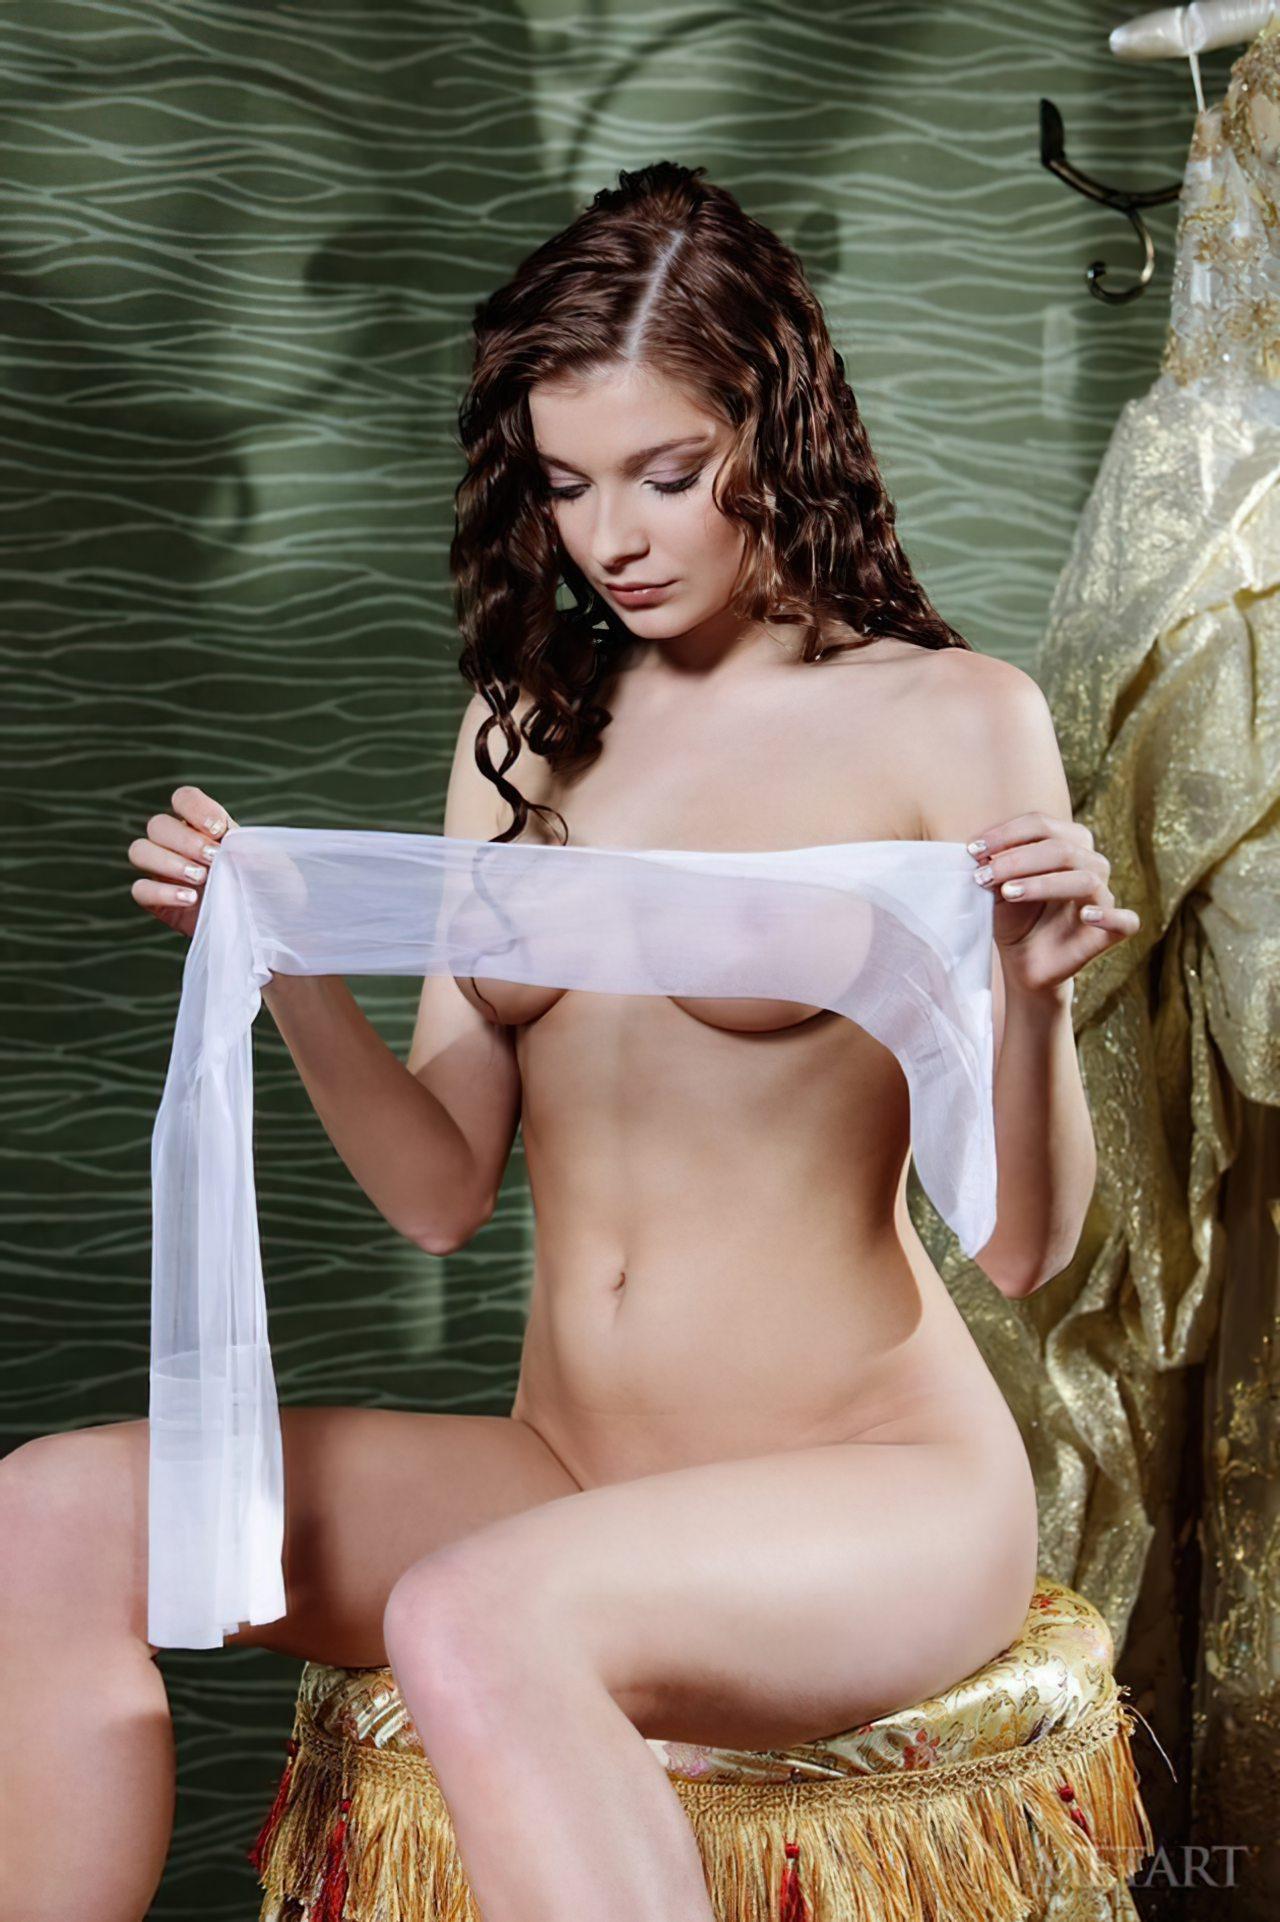 Novinha Vestindo Roupa (3)